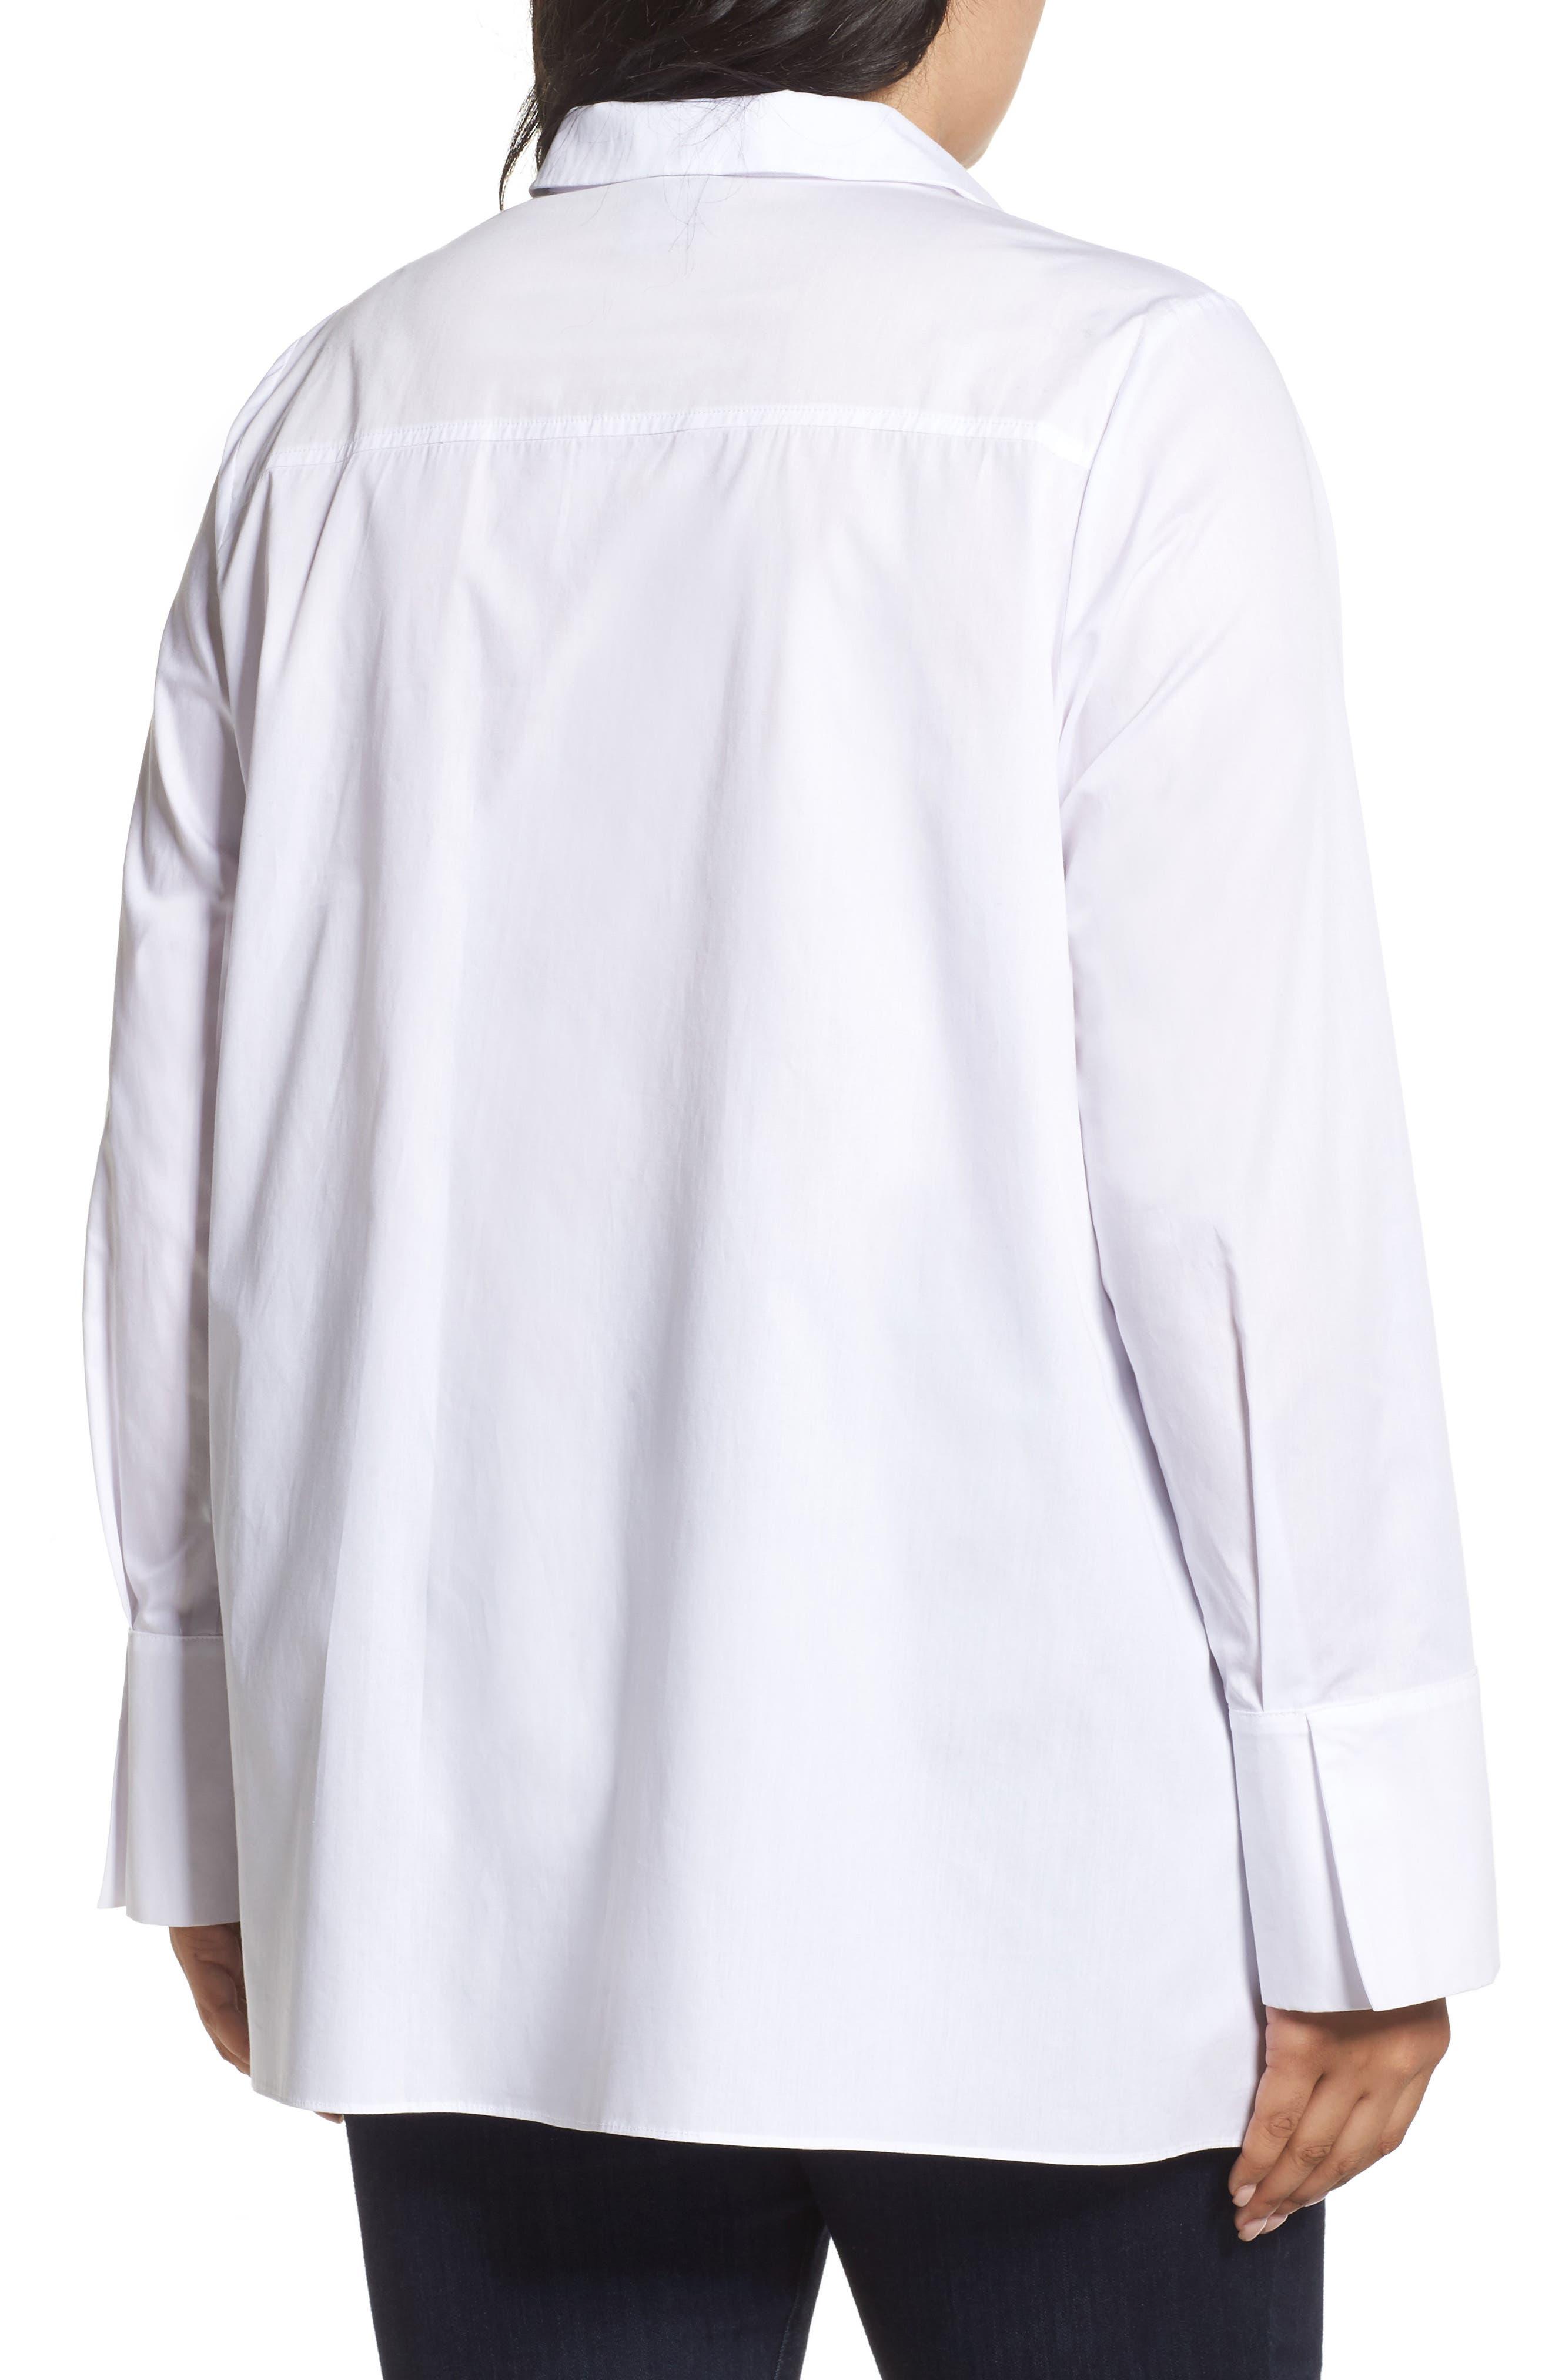 Fato Shirt,                             Alternate thumbnail 2, color,                             White